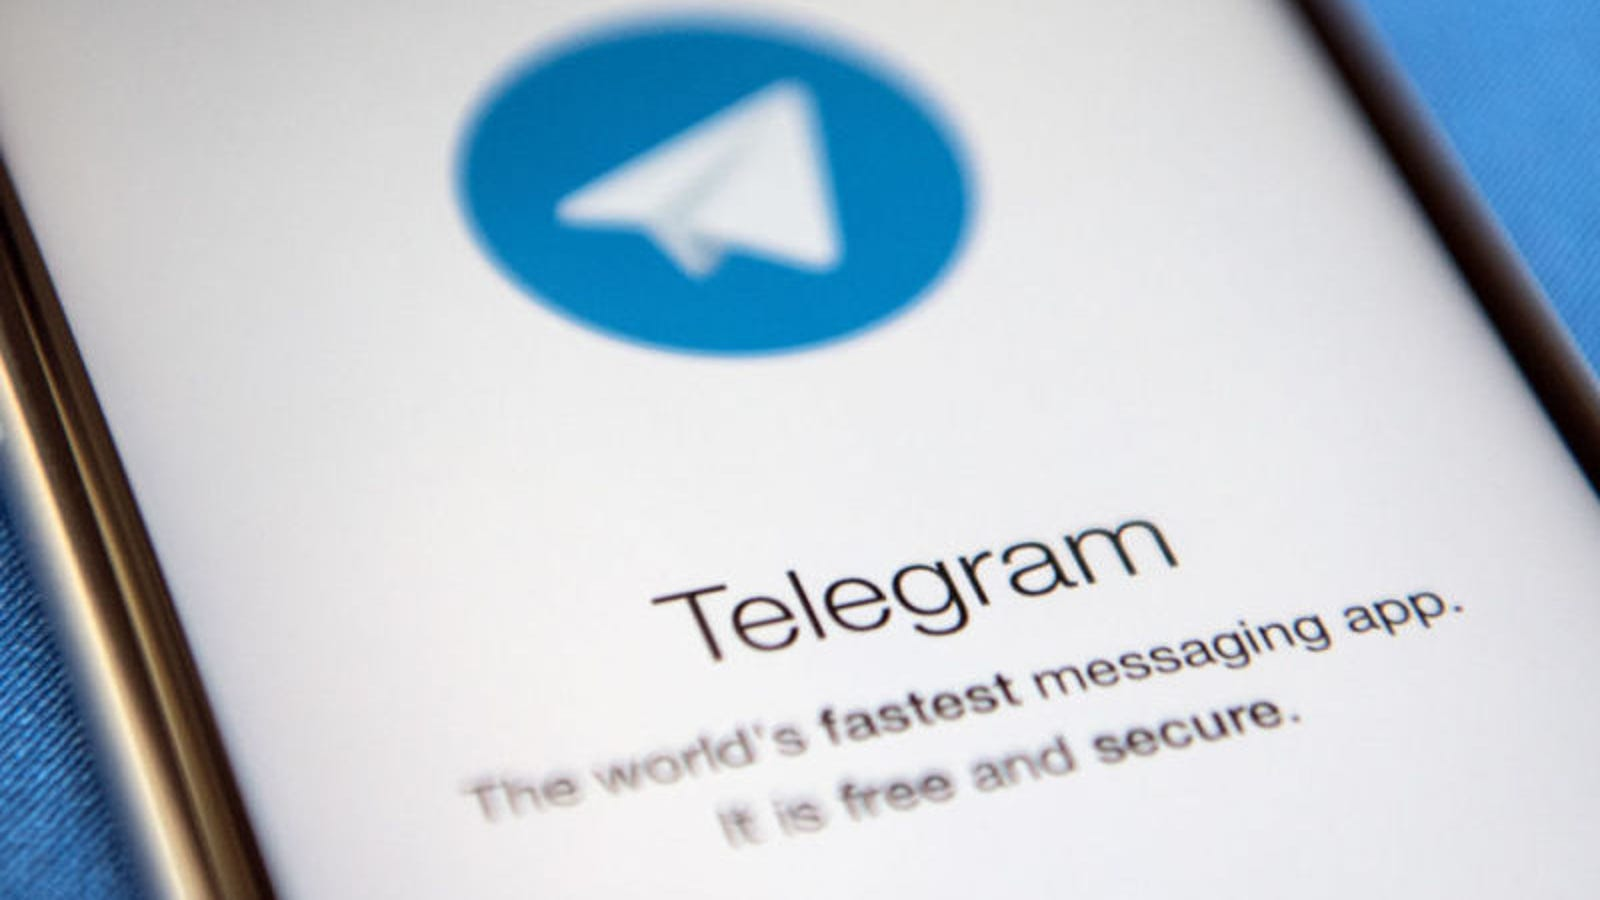 Telegram ganó millones de usuarios por la caída de Facebook